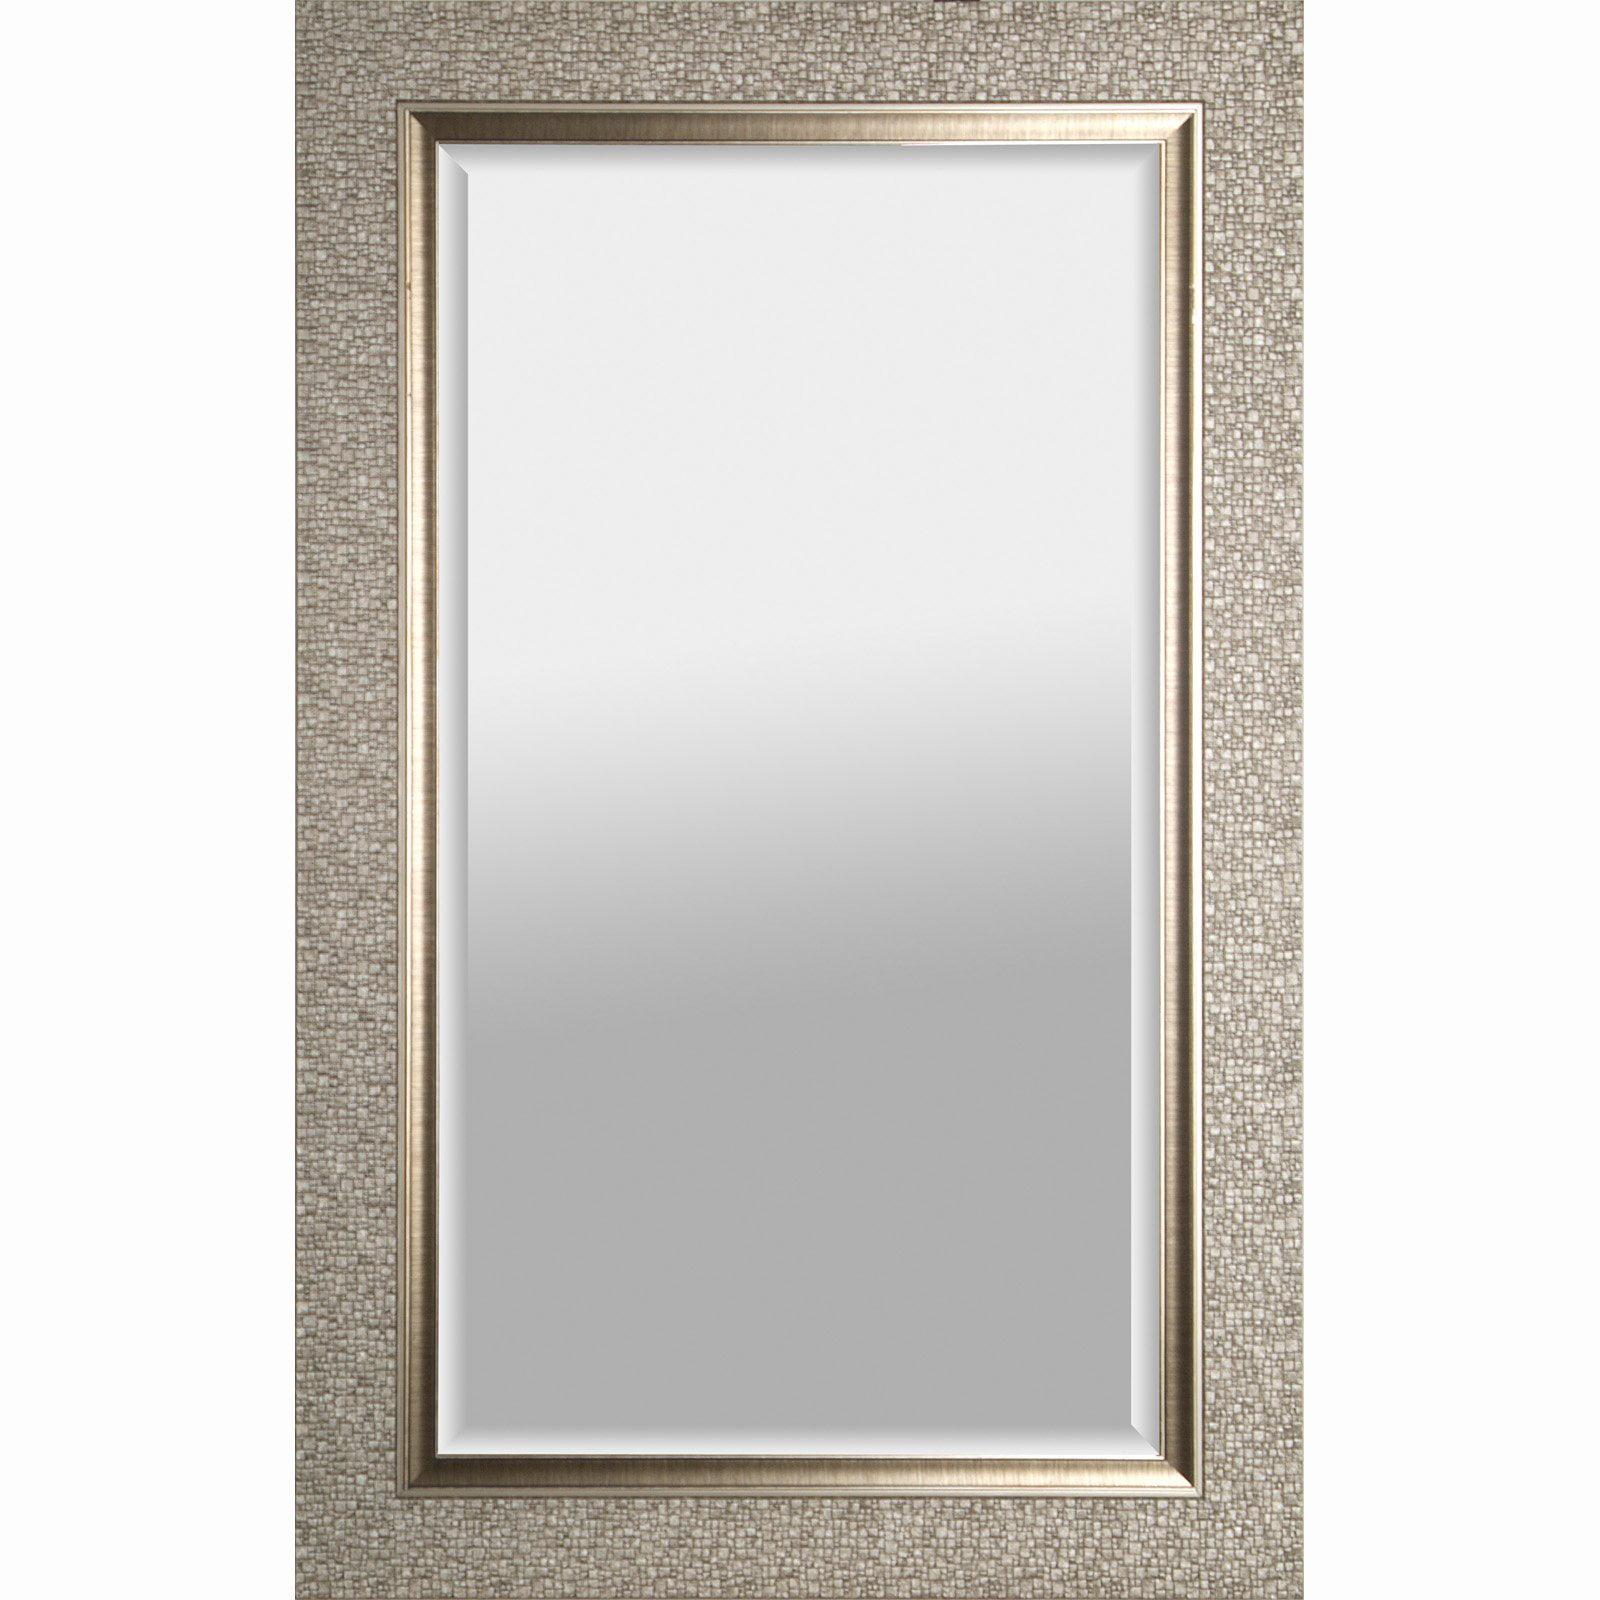 hobbitholeco Designer Beveled Wall Mirror by Overstock